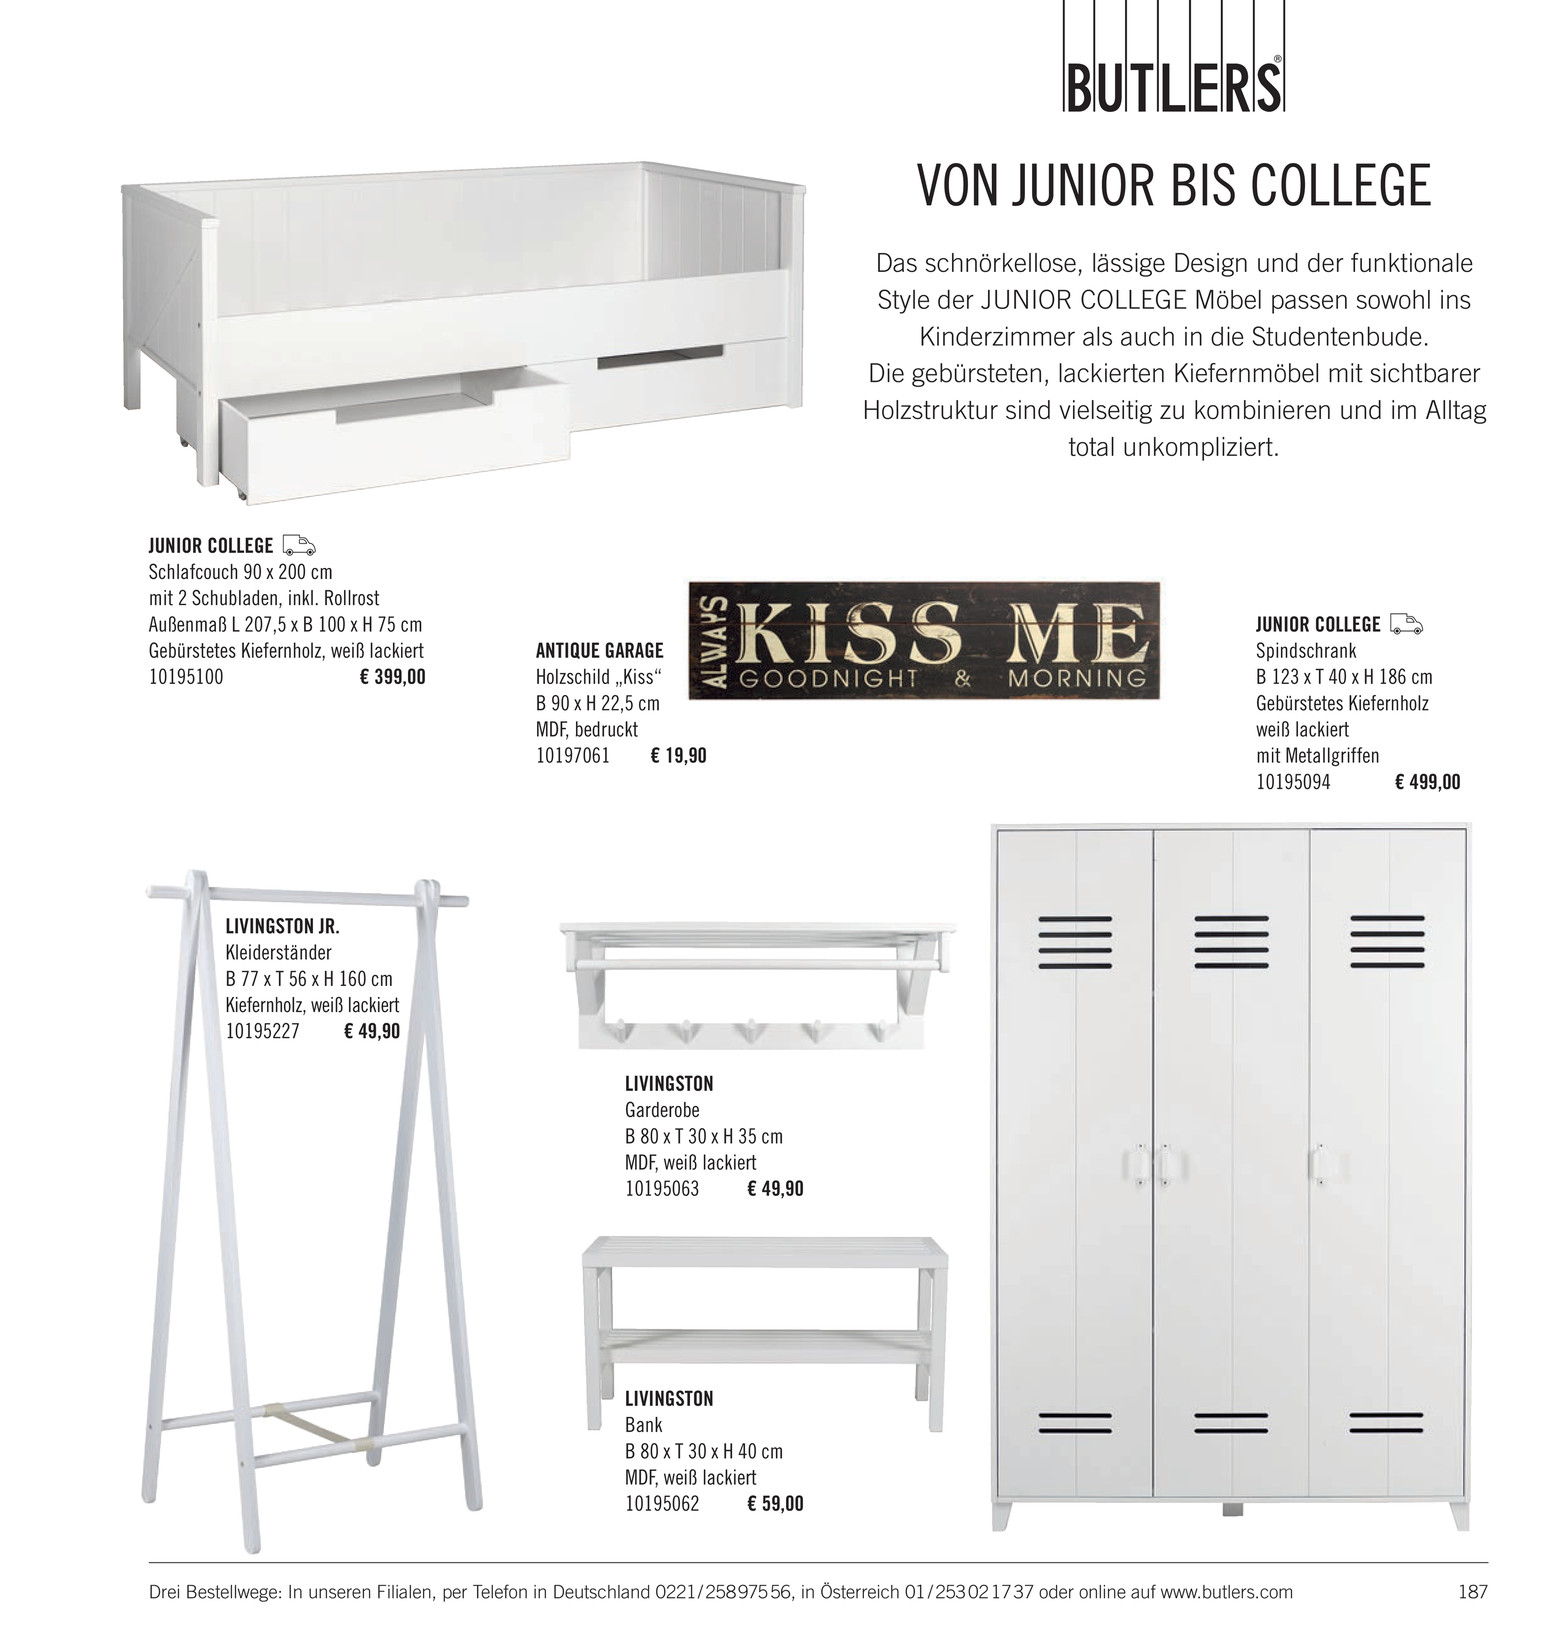 Butlers Katalog De Wohnst Cke Katalog 2014 Seite 186 187